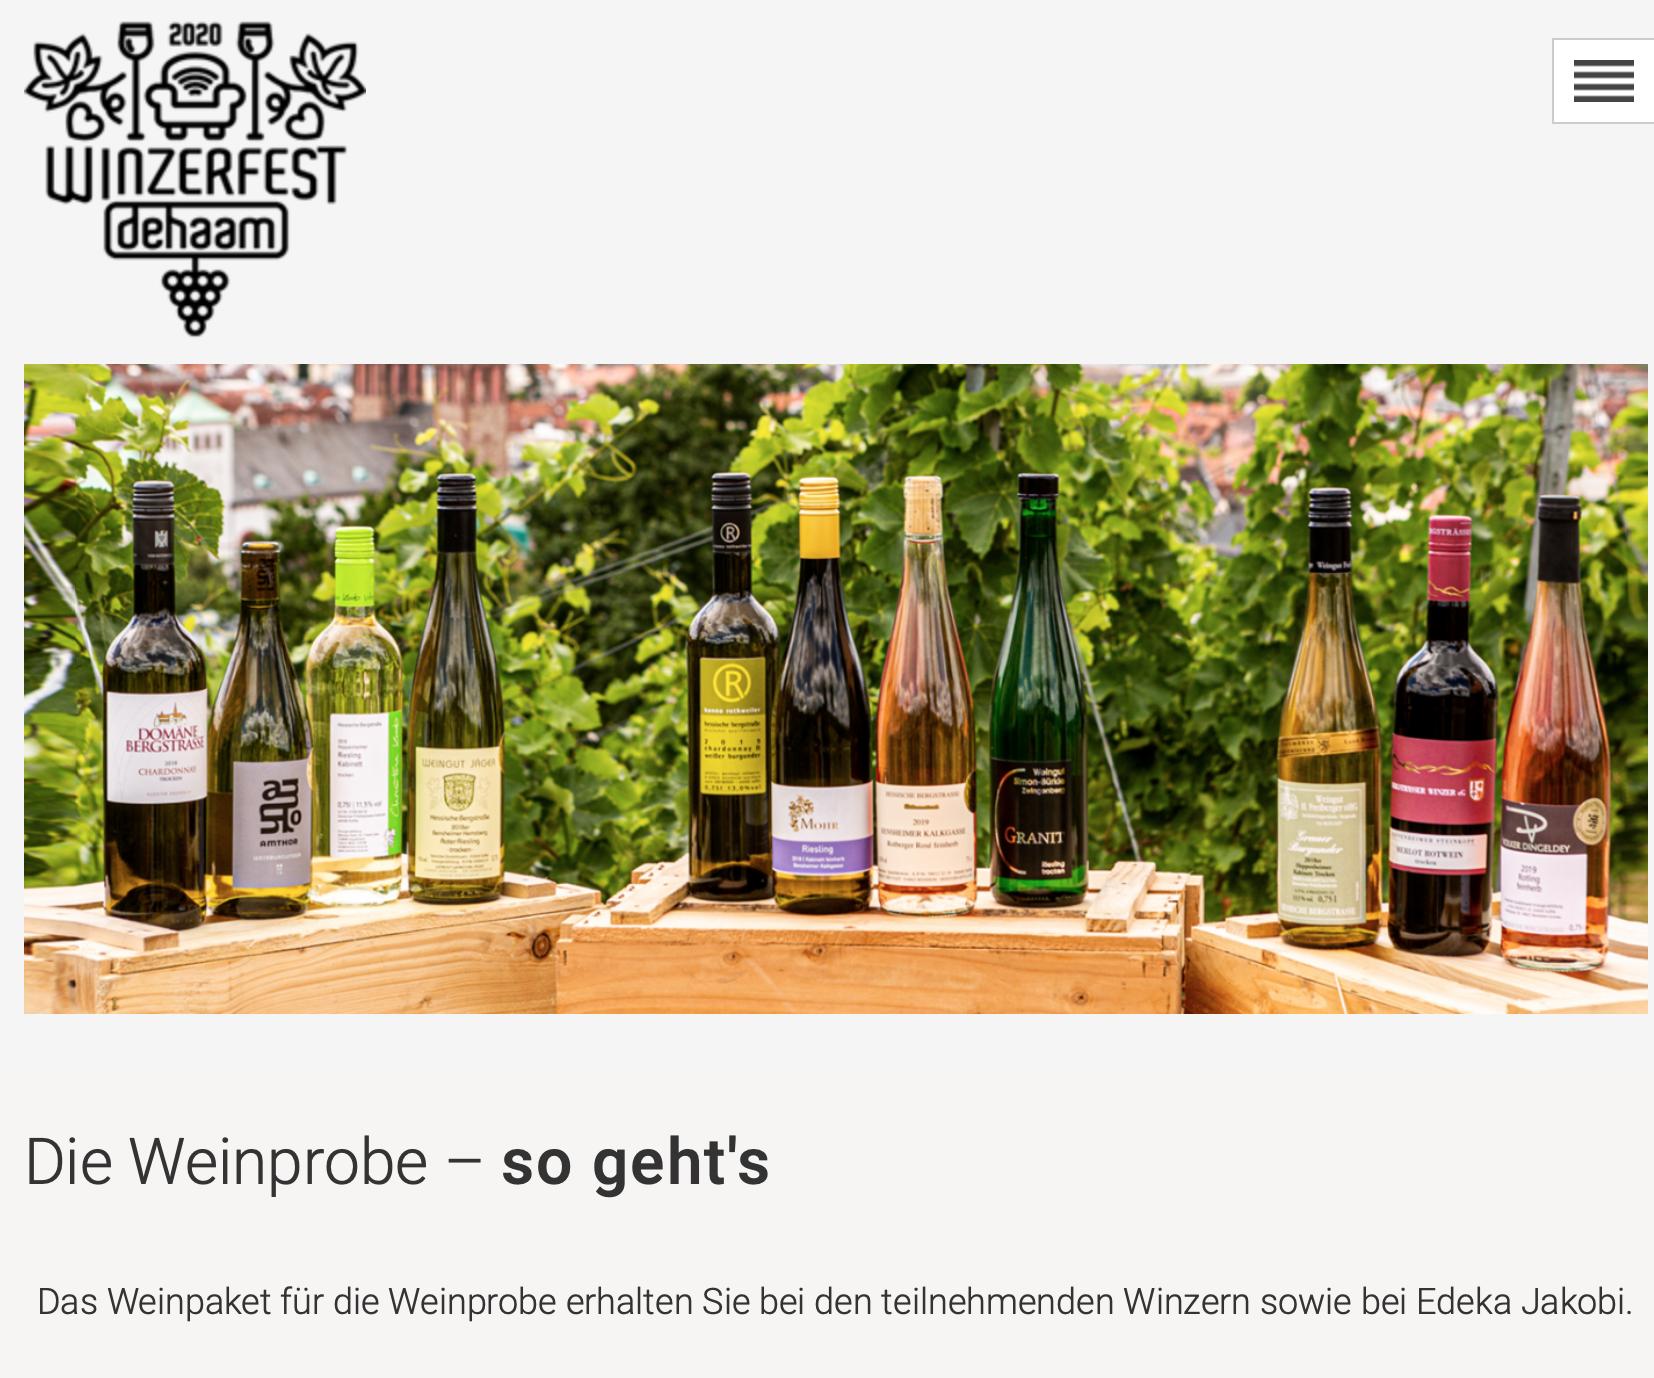 roter riesling-winzerfest dehaam_weinprobe